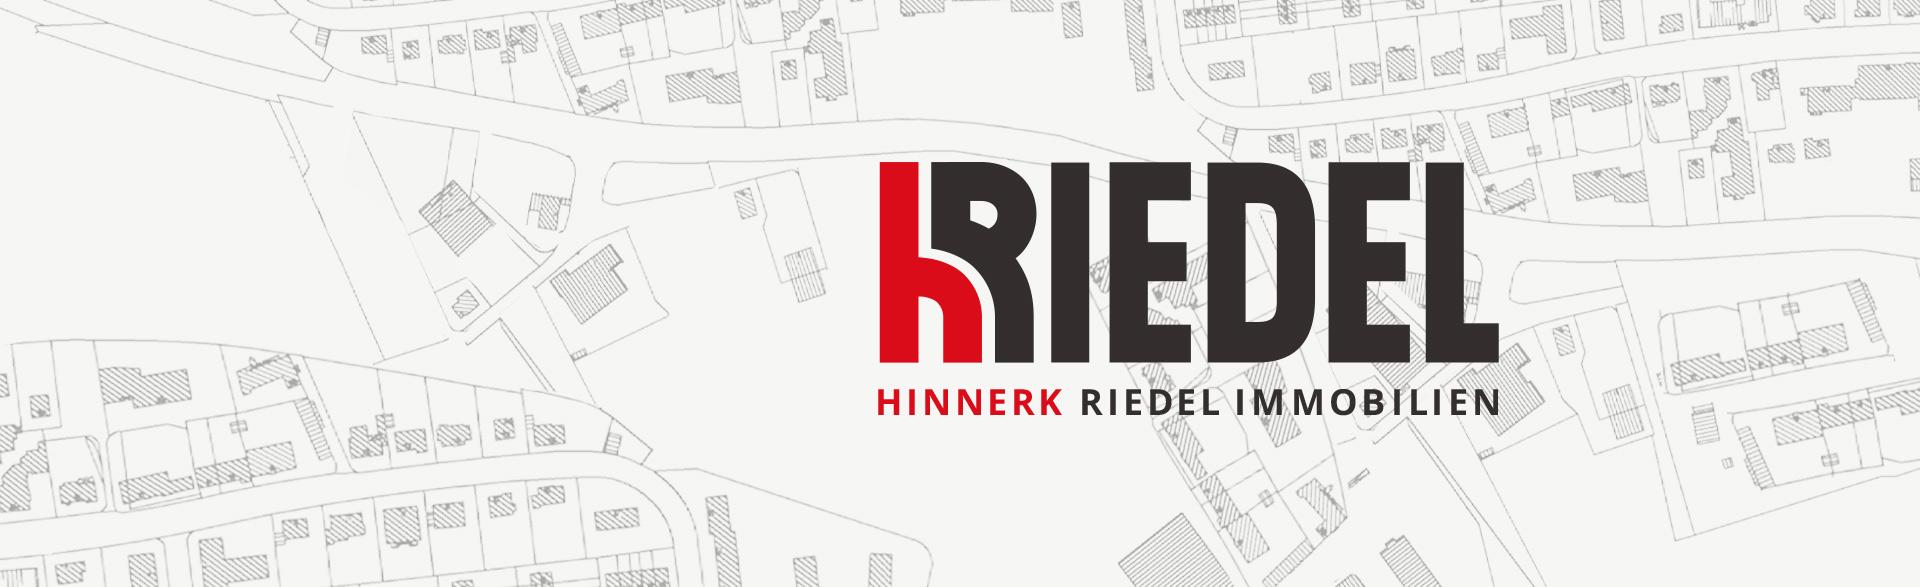 Logo Hinnerk Riedel Immobilien